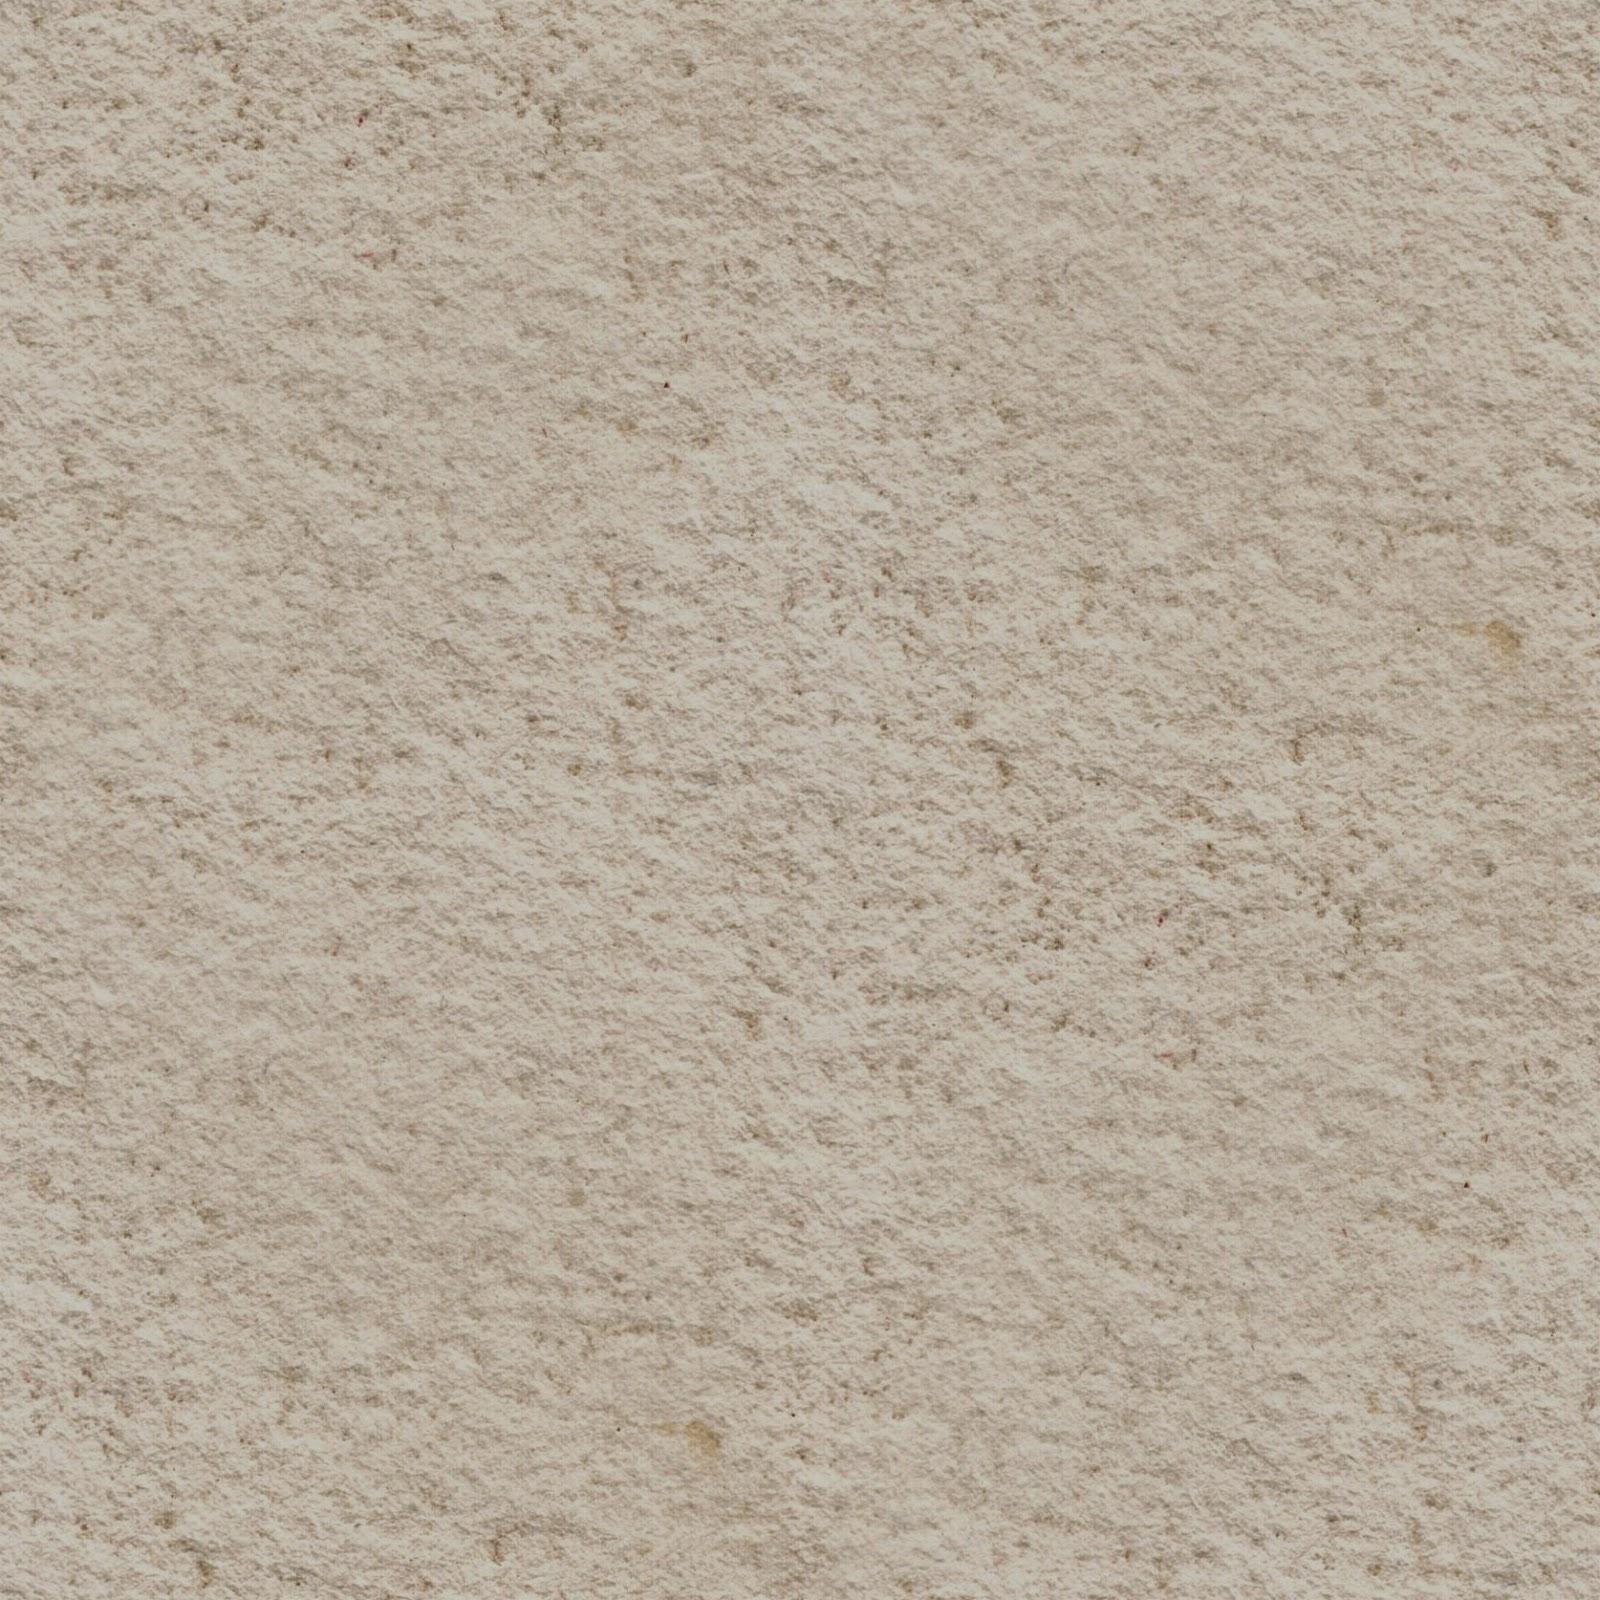 Seamless vintage paper texture